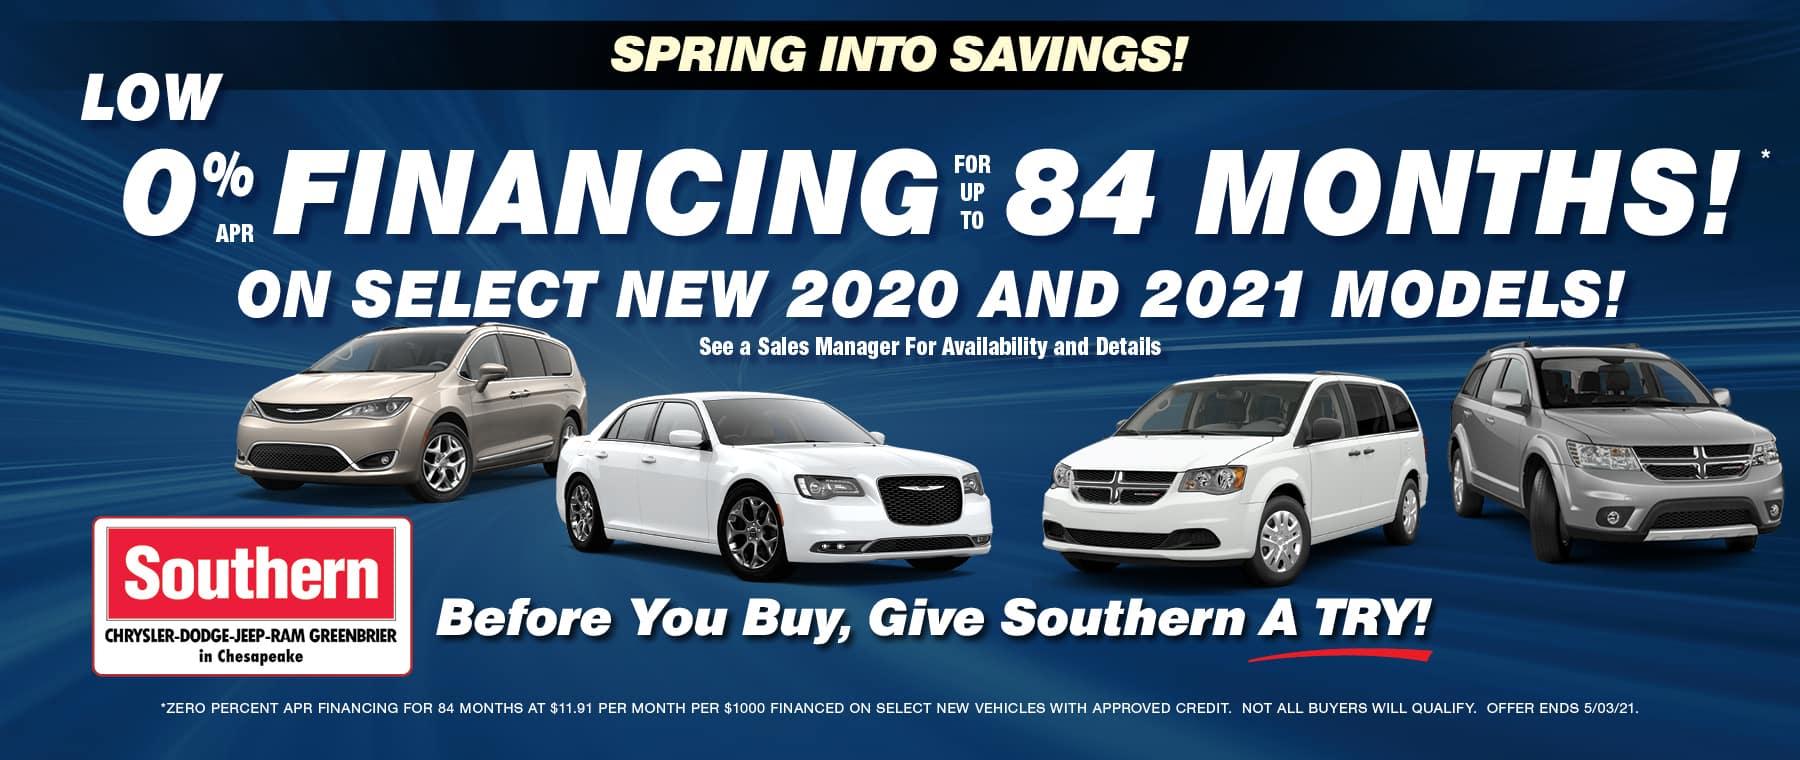 Southern Chrysler – Greenbrier